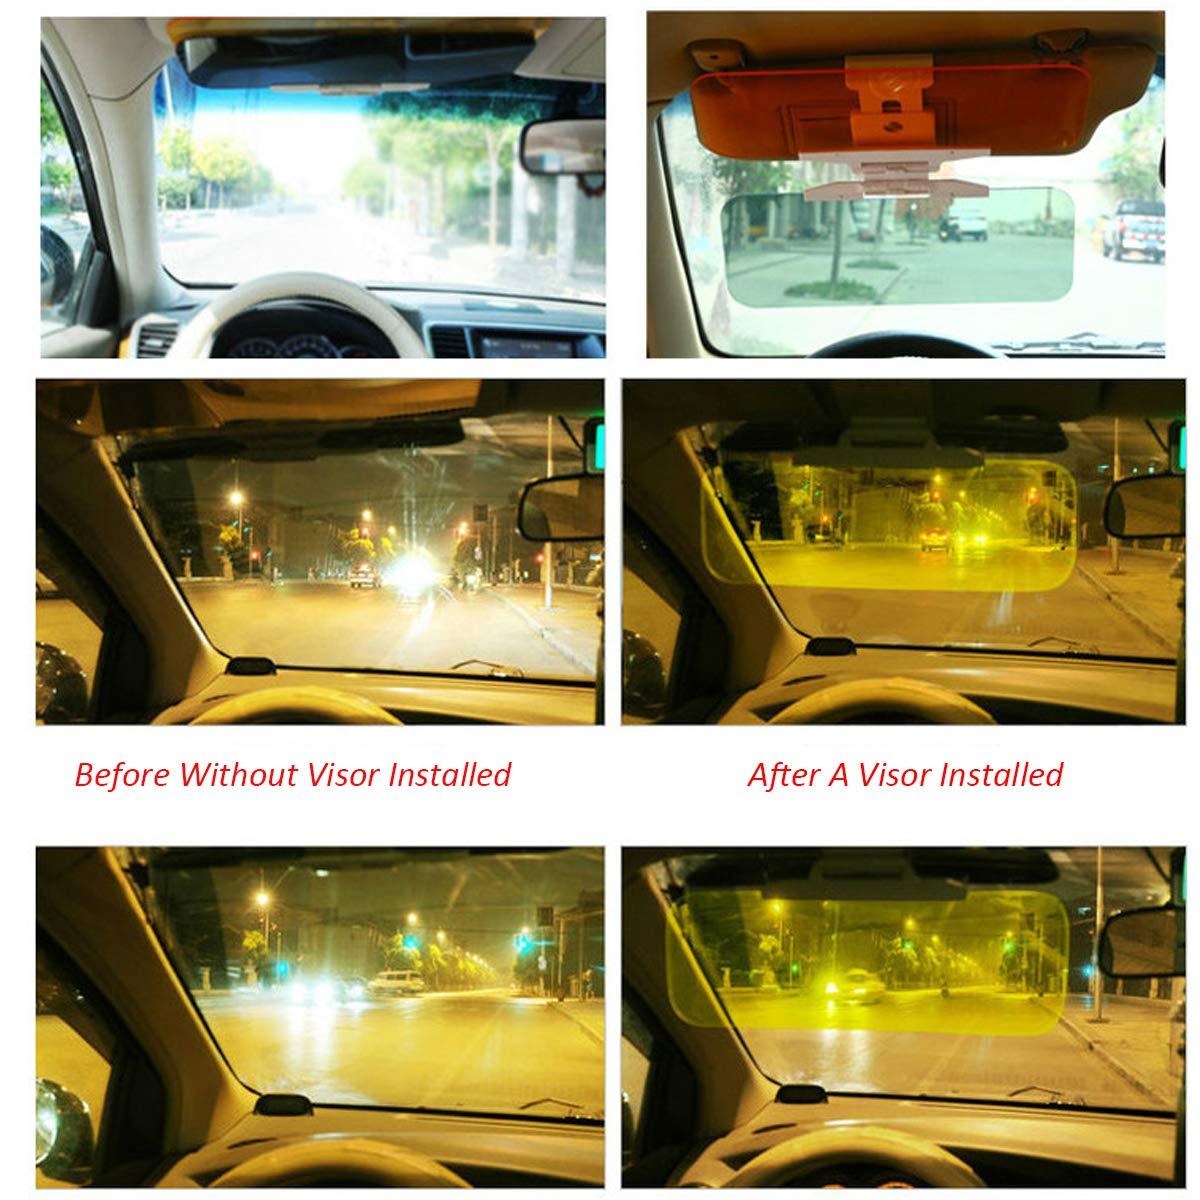 Sun Tac Visor Driving Traffic Safety Accessories-Night Goggles Sun Blocker Latest Version CT SUV/&Small Cars Visor Extender Length Extension Eagle Visor Windshield Day and Night Anti Glare Anti Dazzle Mirror